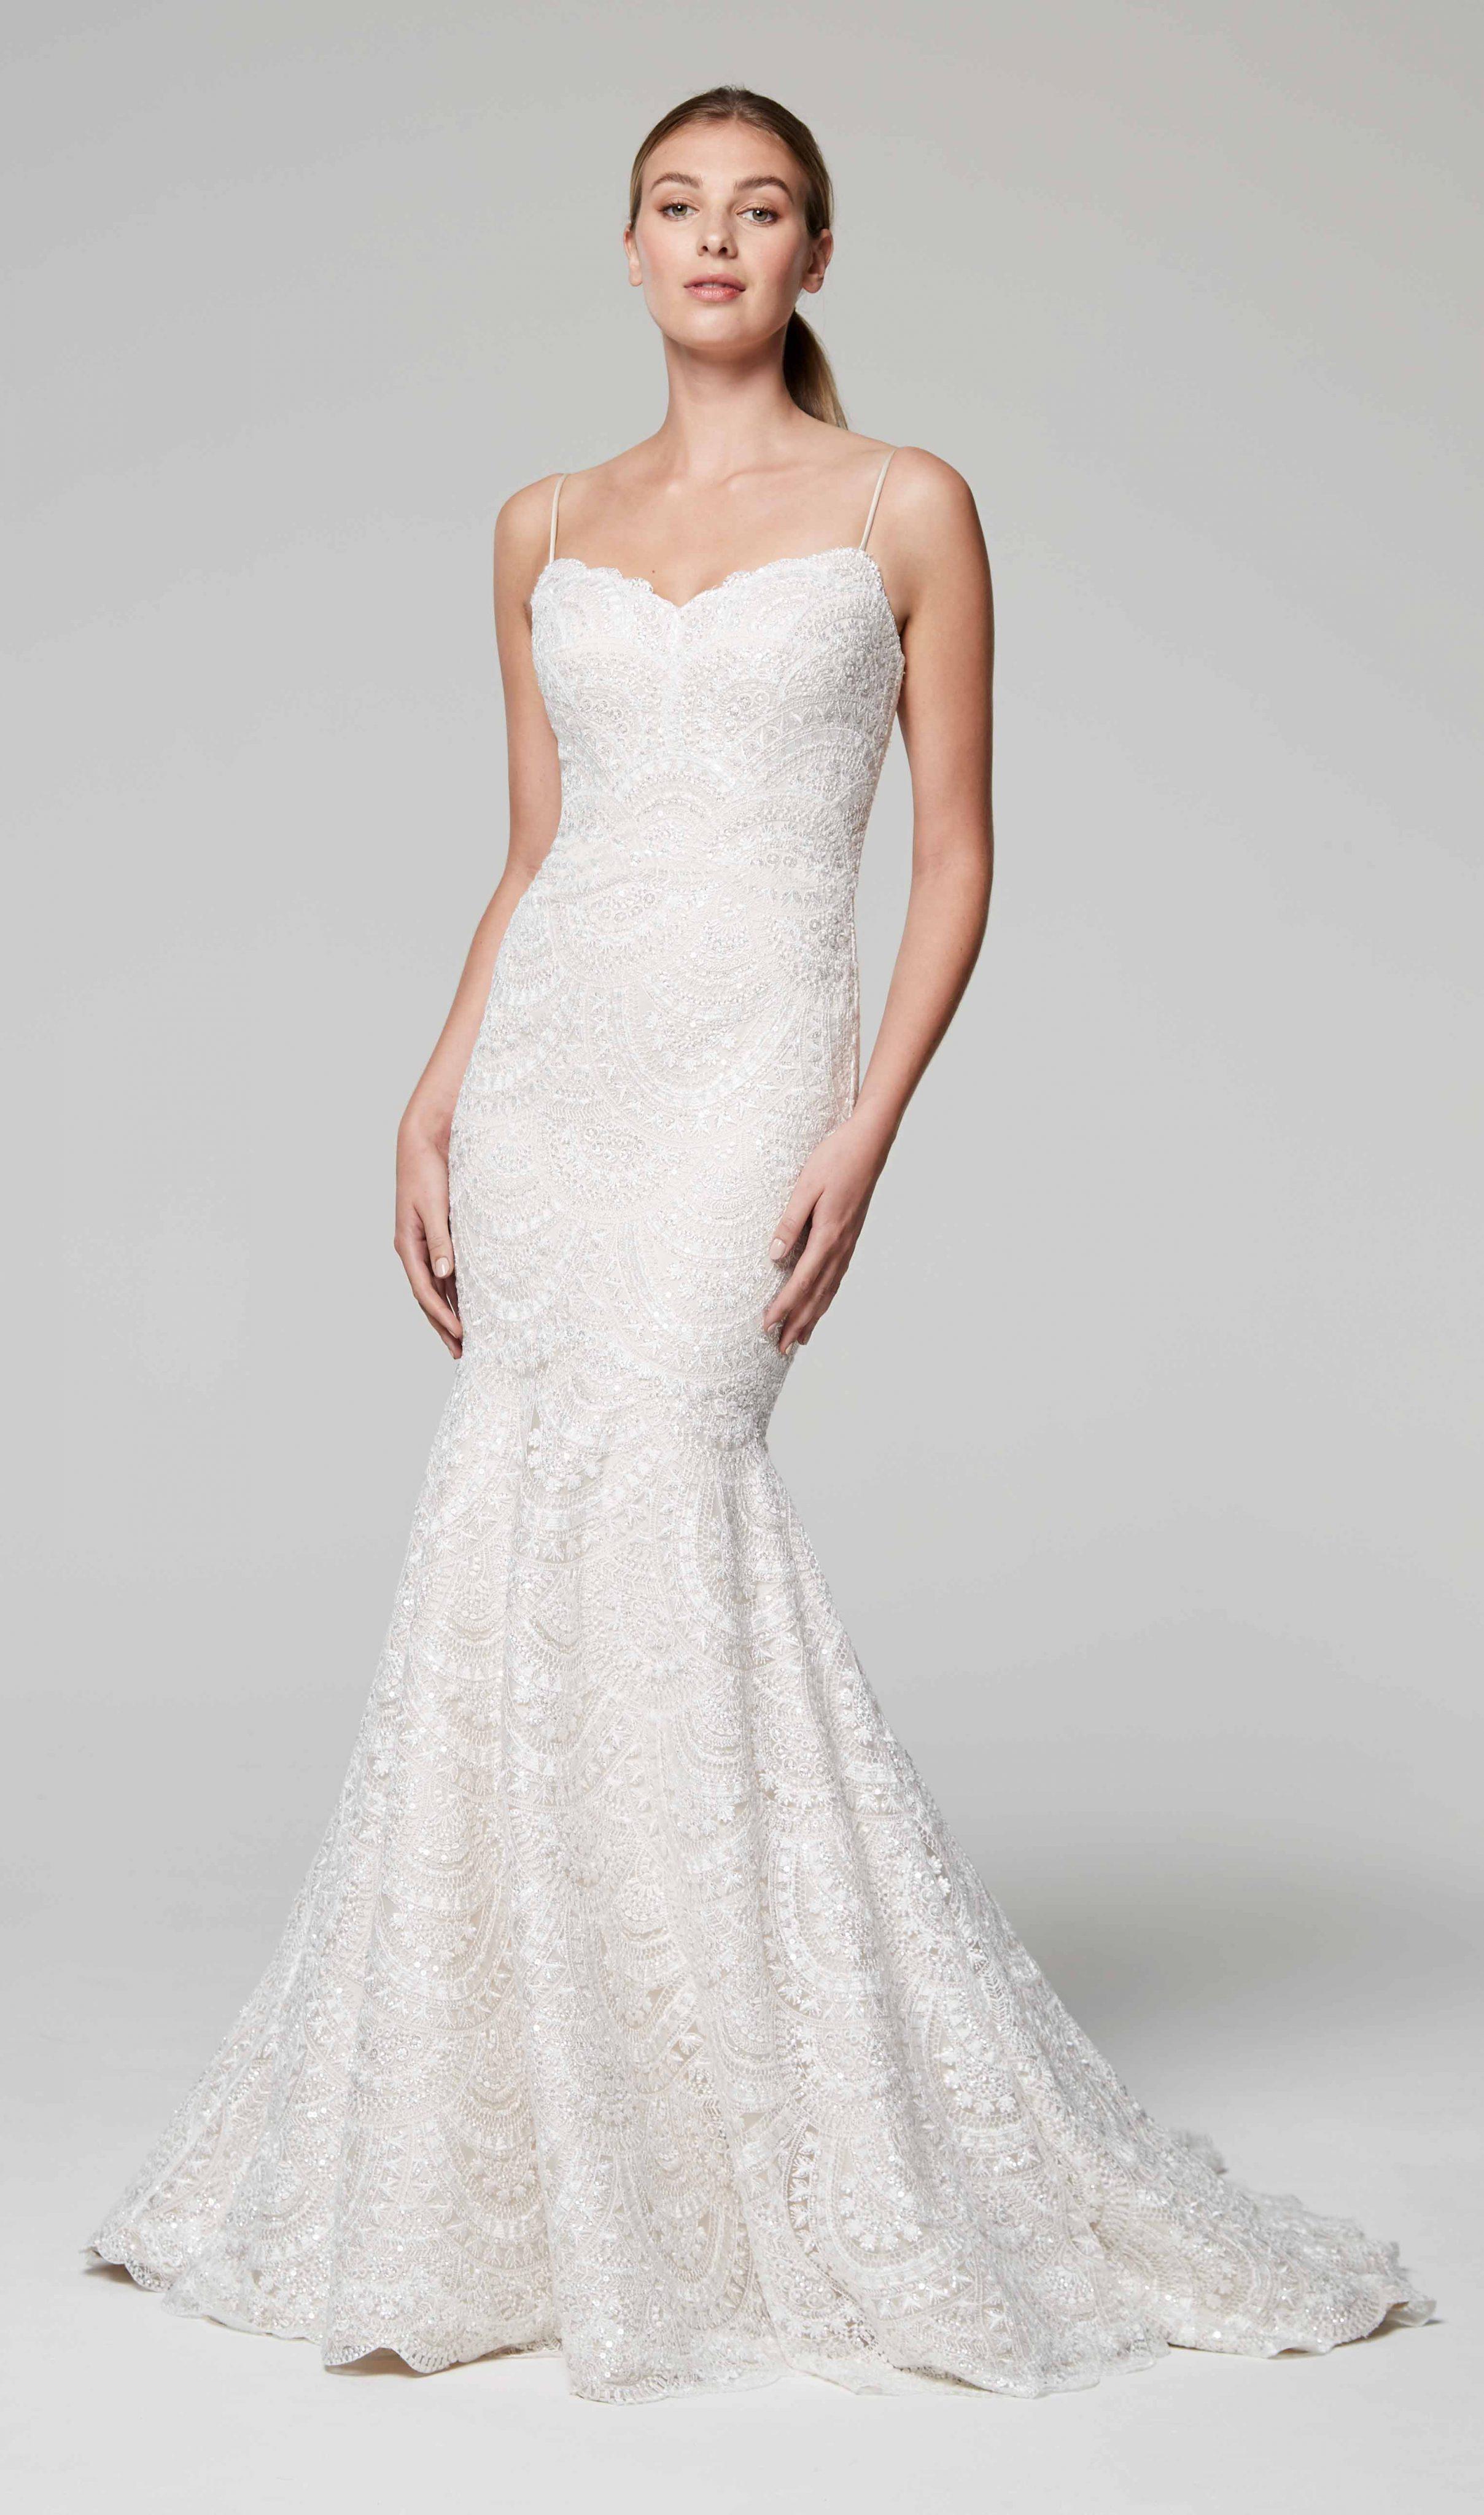 8b0da26b1bf7 Spaghetti Strap Sweetheart Neckline Beaded Mermaid Wedding Dress |  Kleinfeld Bridal